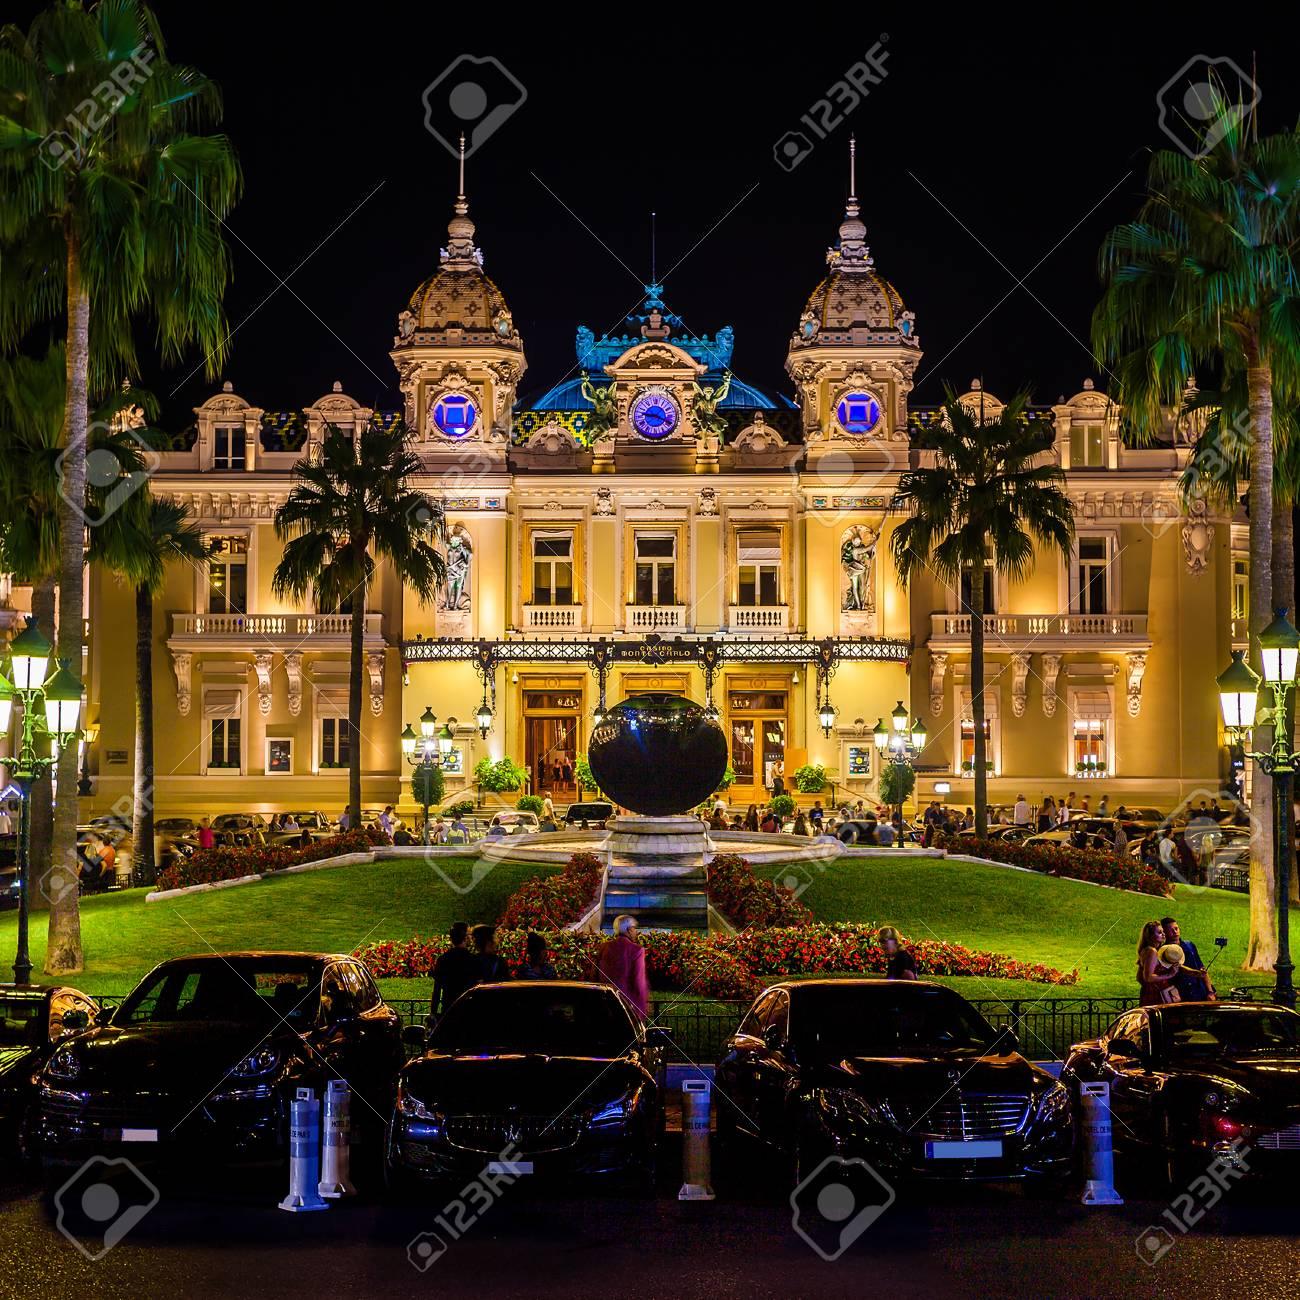 The grand casino monte carlo indigo sky casino pool